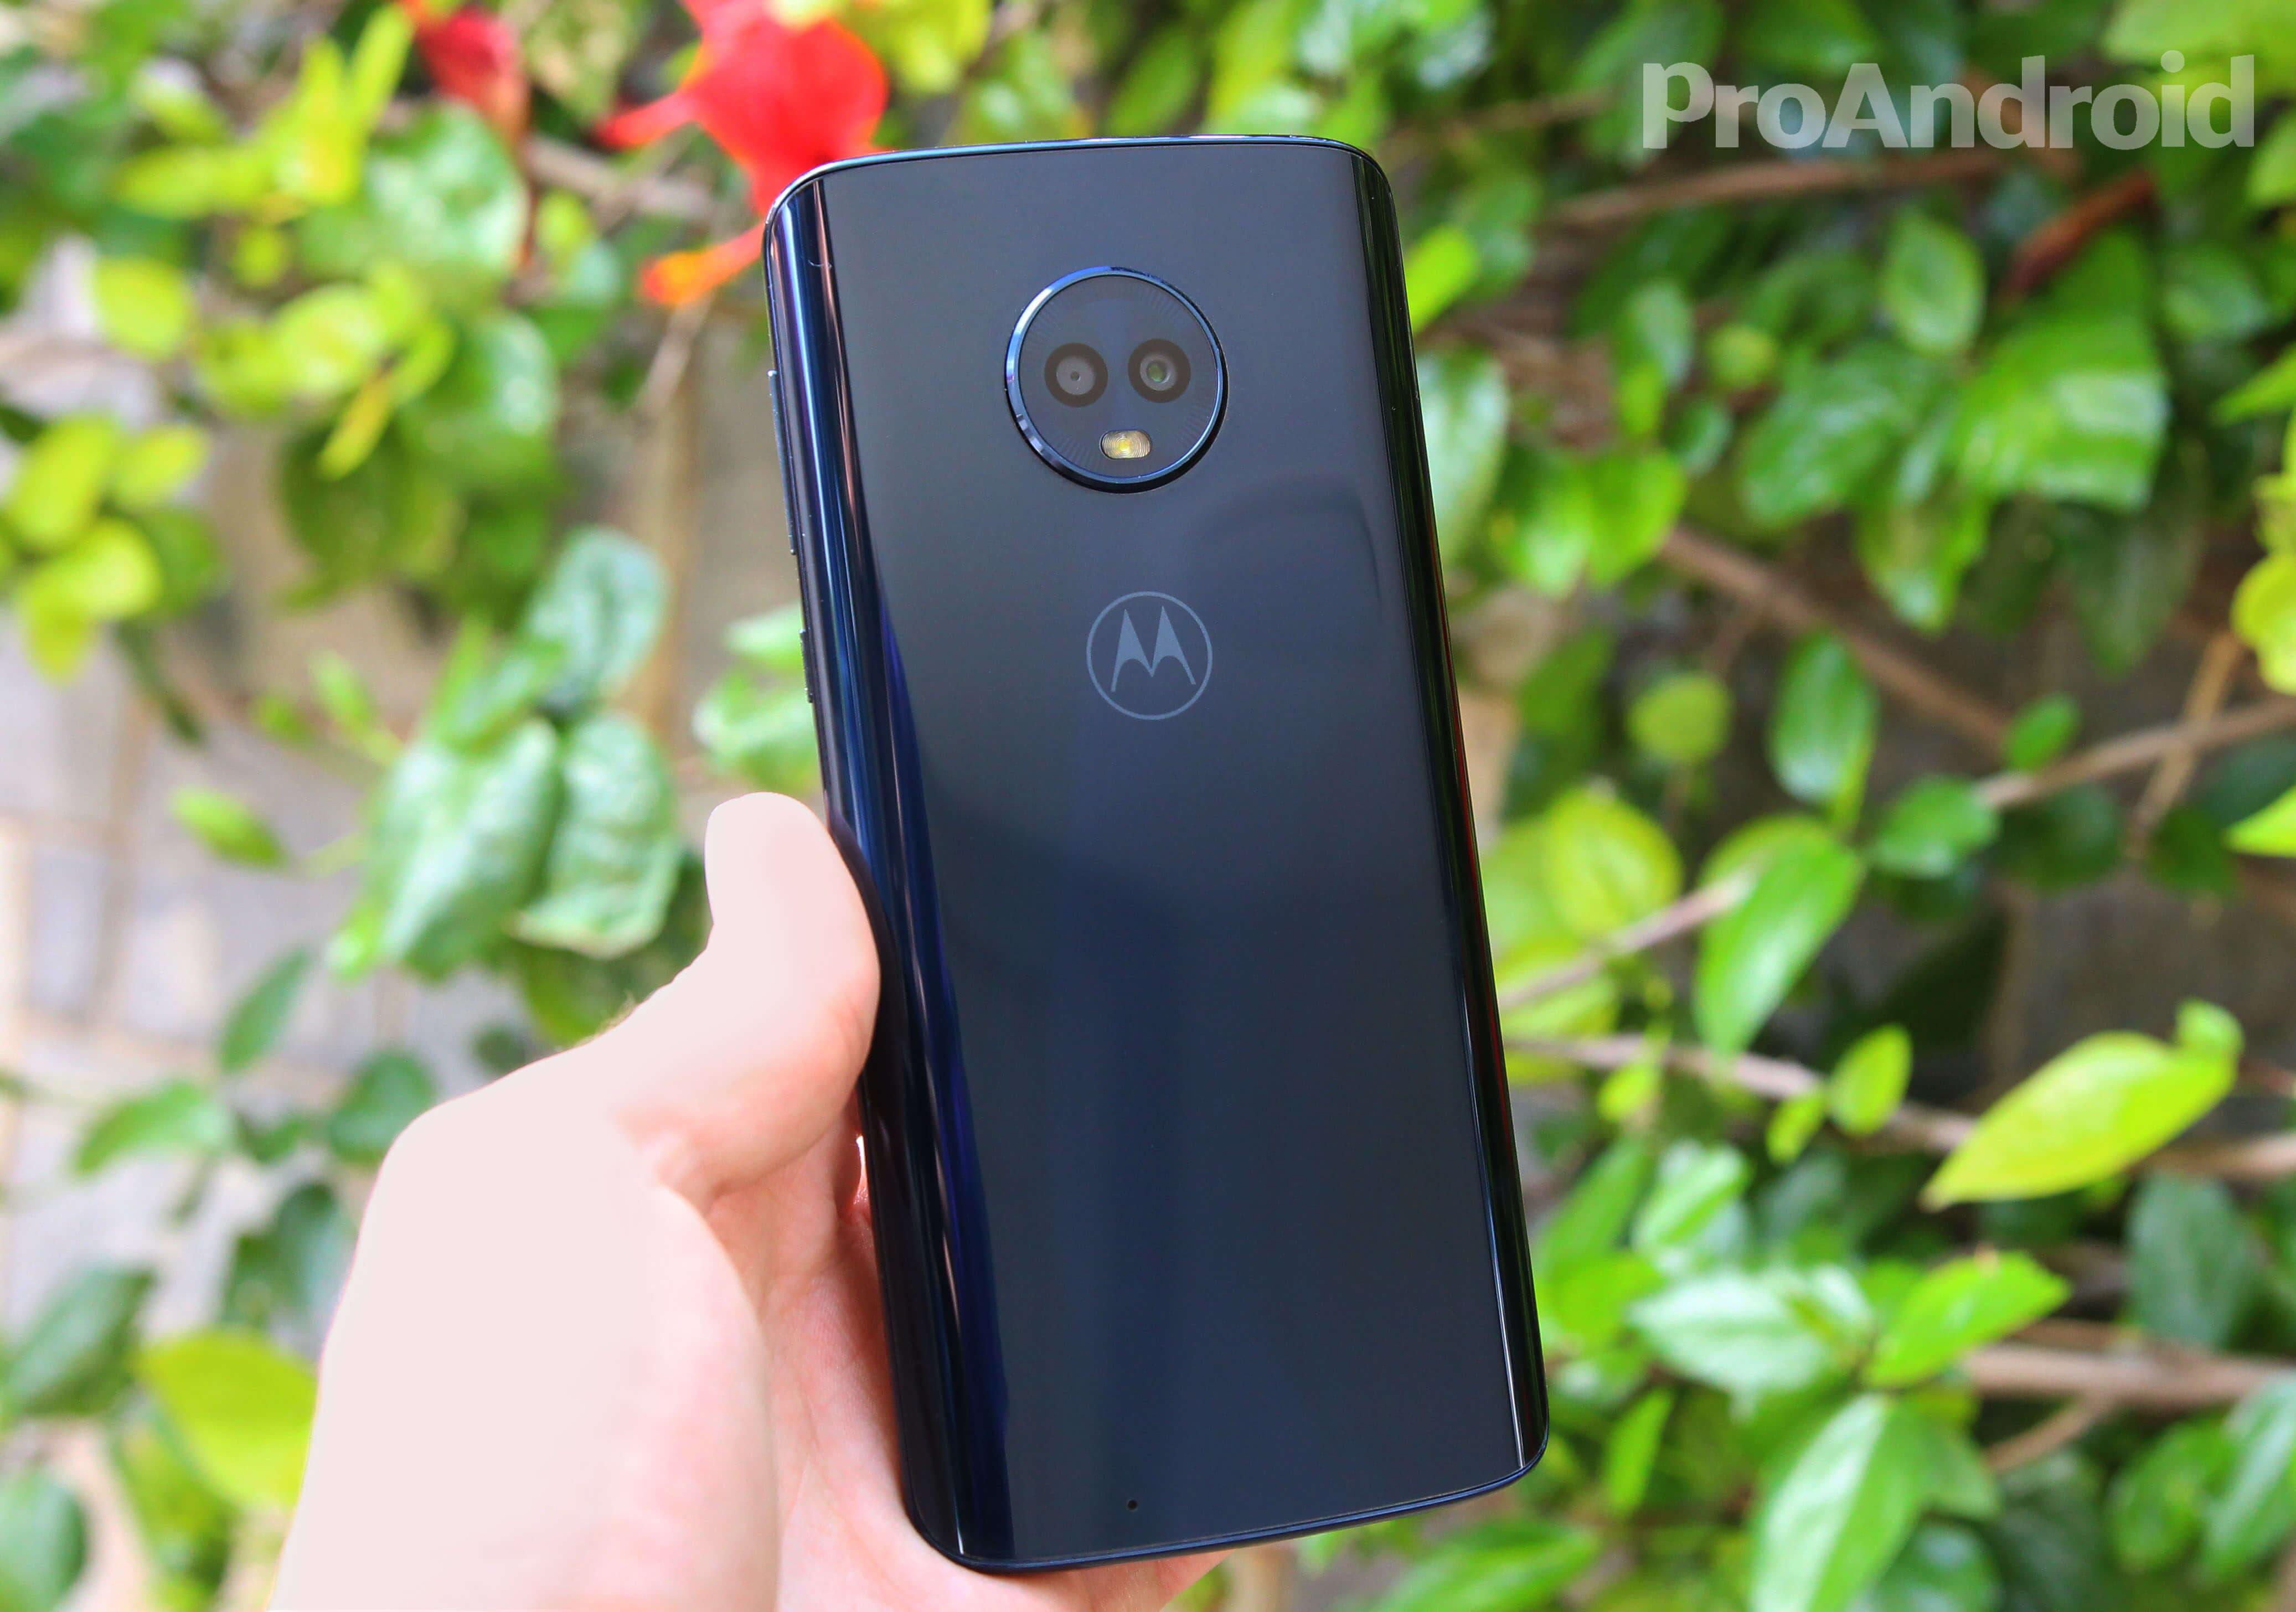 Ahórrate 70 euros con esta oferta del Motorola Moto G6